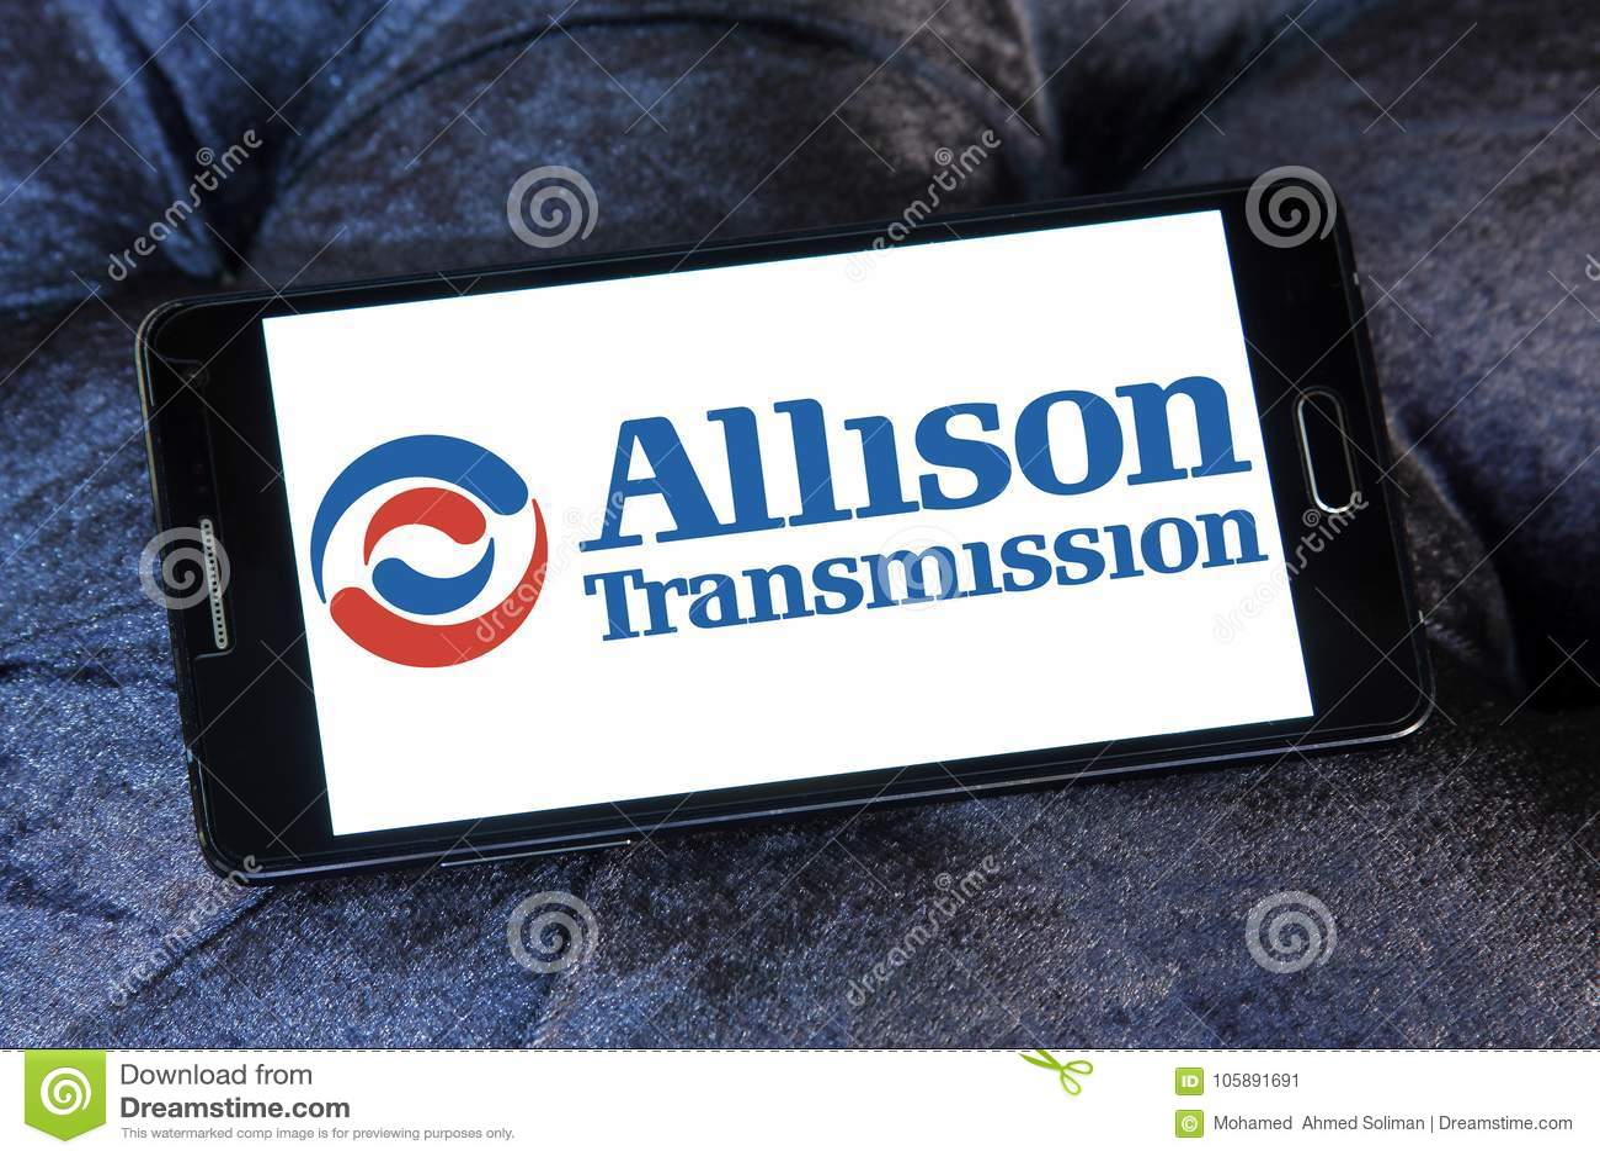 Allison Transmission Logo Editorial Photo Image Of Brands 105891691